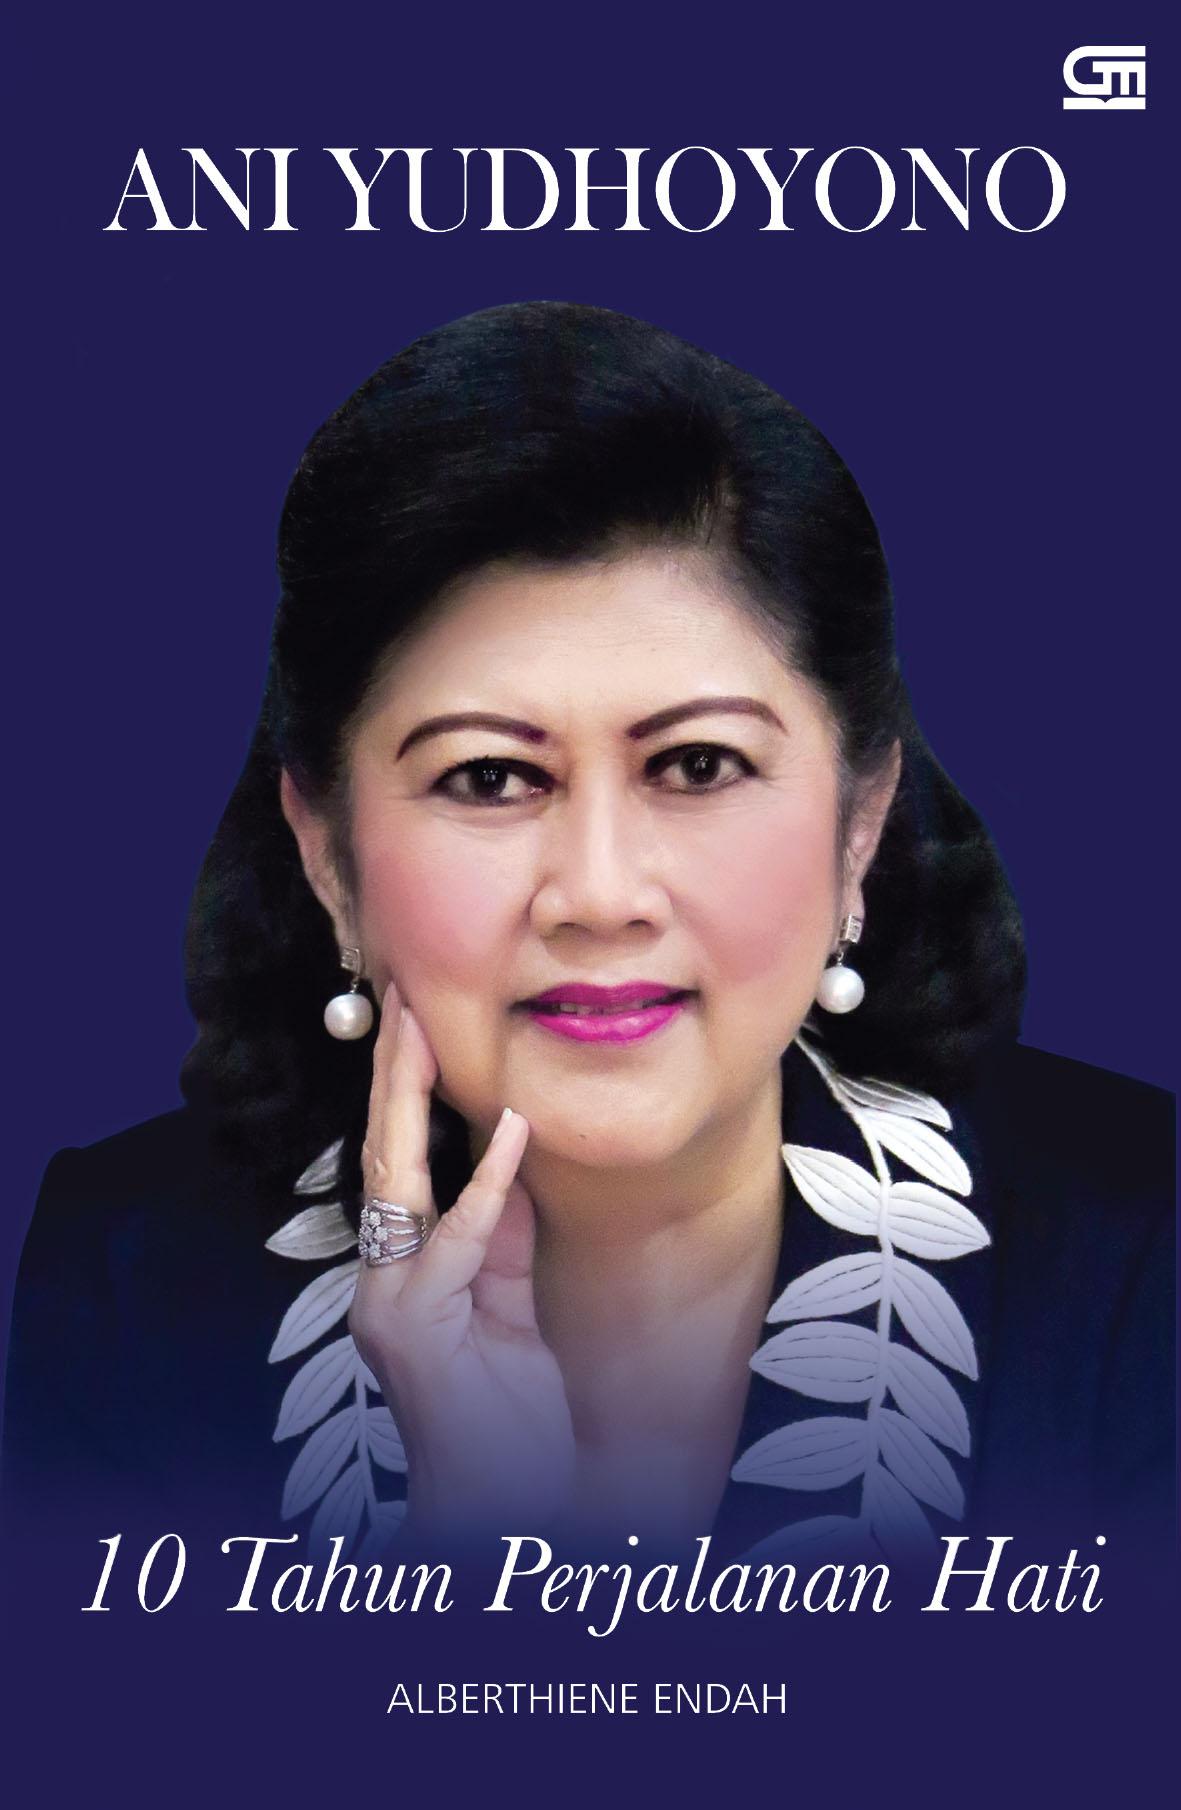 Ani Yudhoyono: 10th Perjalanan Hati